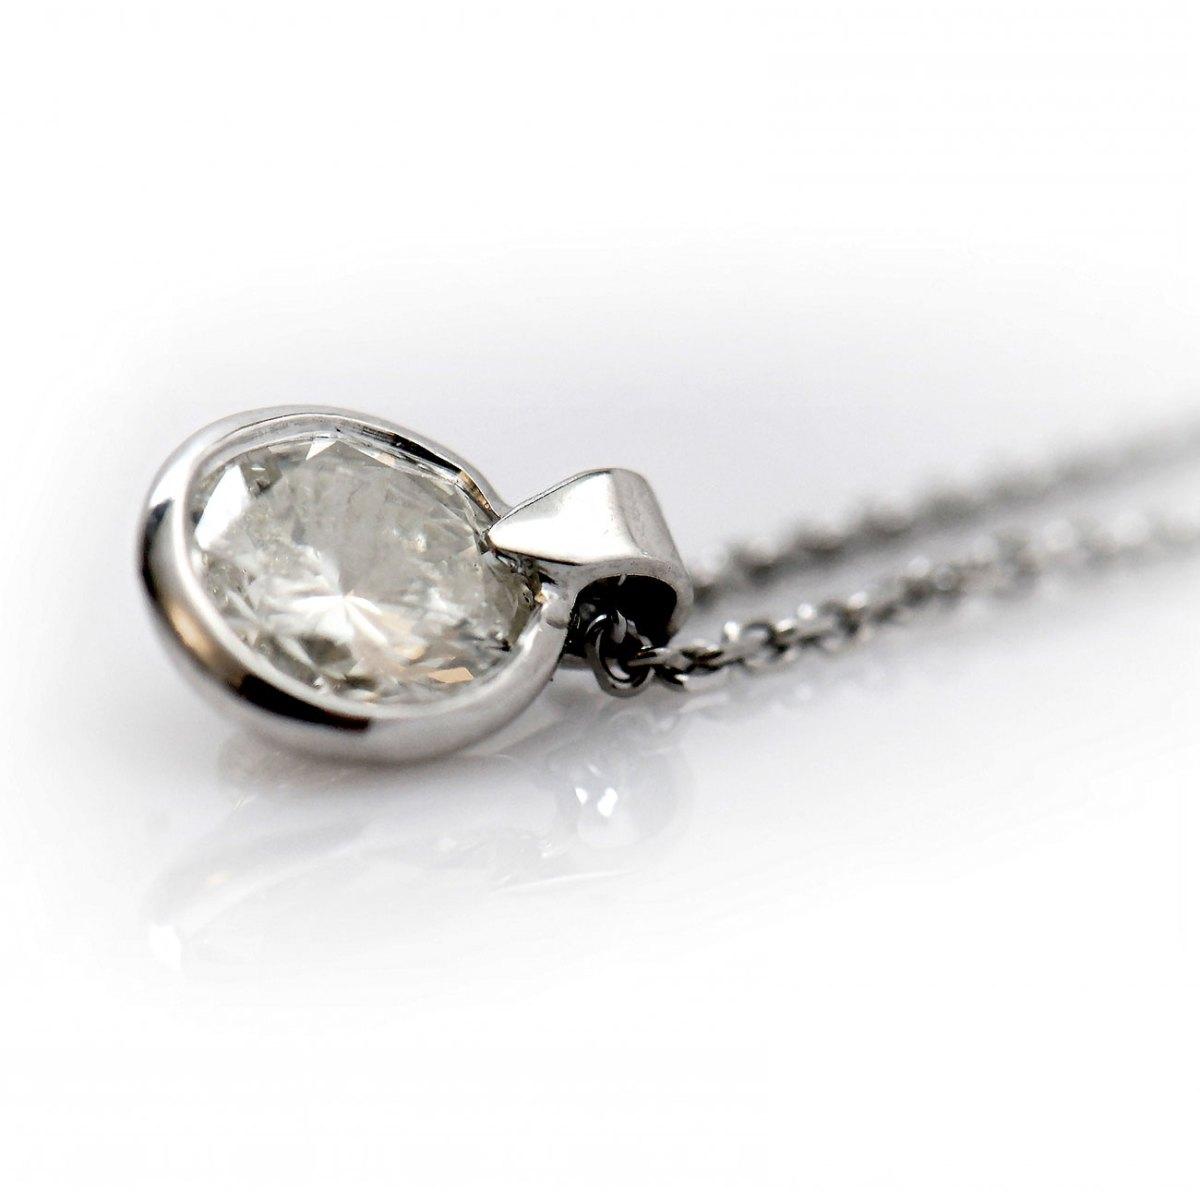 Solitaire Diamond Pendant, 1.12ct, chain, 18K white gold, ref. PE+CH-1548 | EVENOR Jewellery • Brand new and vintage jewellery